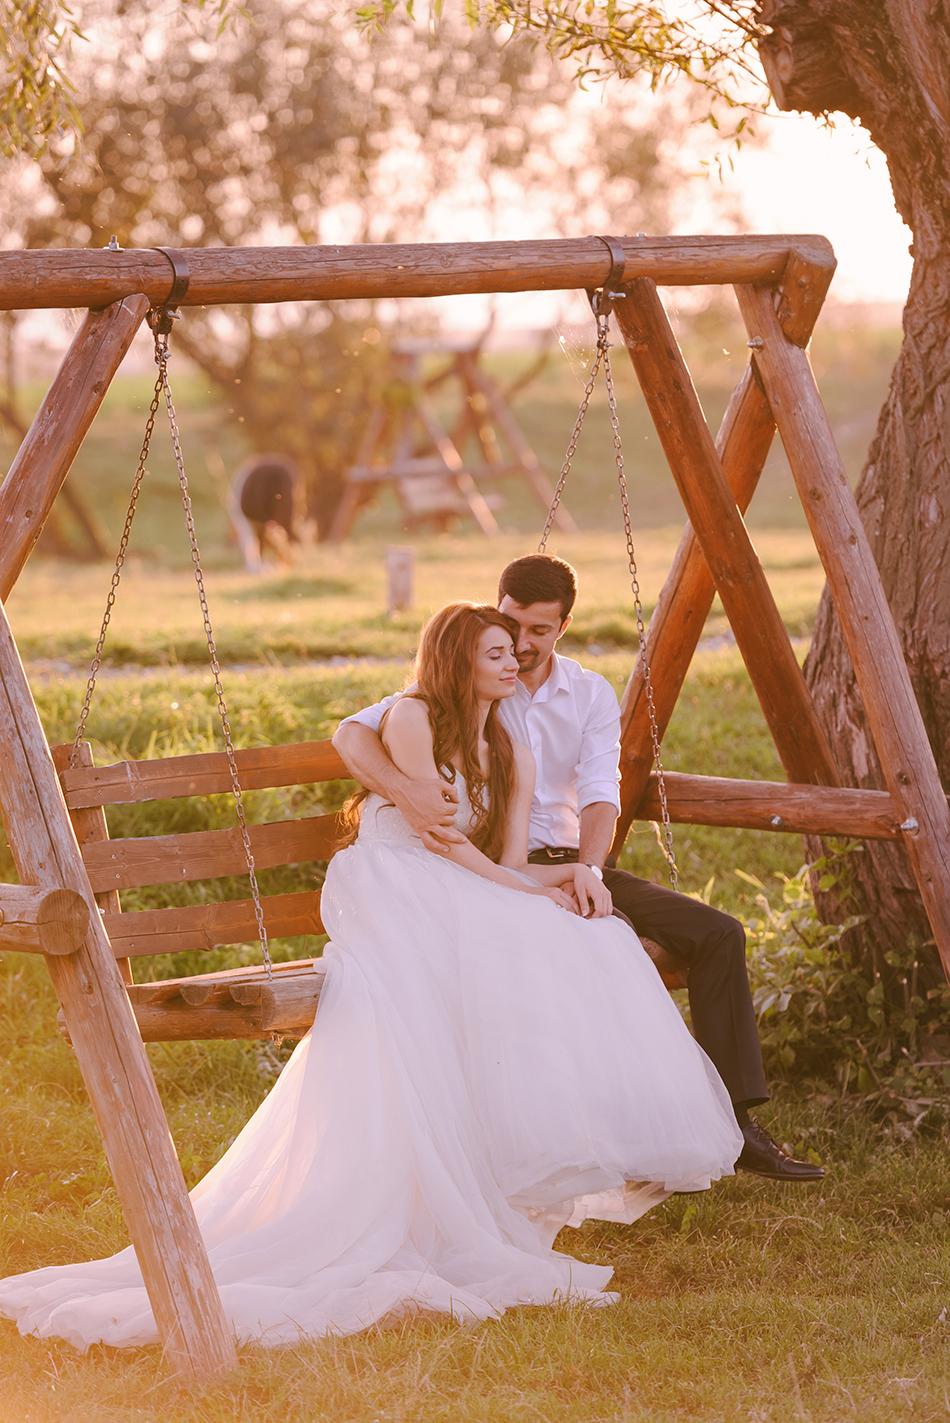 AD Passion Photography | fotograf-nunta-brasov-poiana-brasov-fotograf-profesionist_lorena-cristi_ttd_0081 | Adelin, Dida, fotograf profesionist, fotograf de nunta, fotografie de nunta, fotograf Timisoara, fotograf Craiova, fotograf Bucuresti, fotograf Arad, nunta Timisoara, nunta Arad, nunta Bucuresti, nunta Craiova